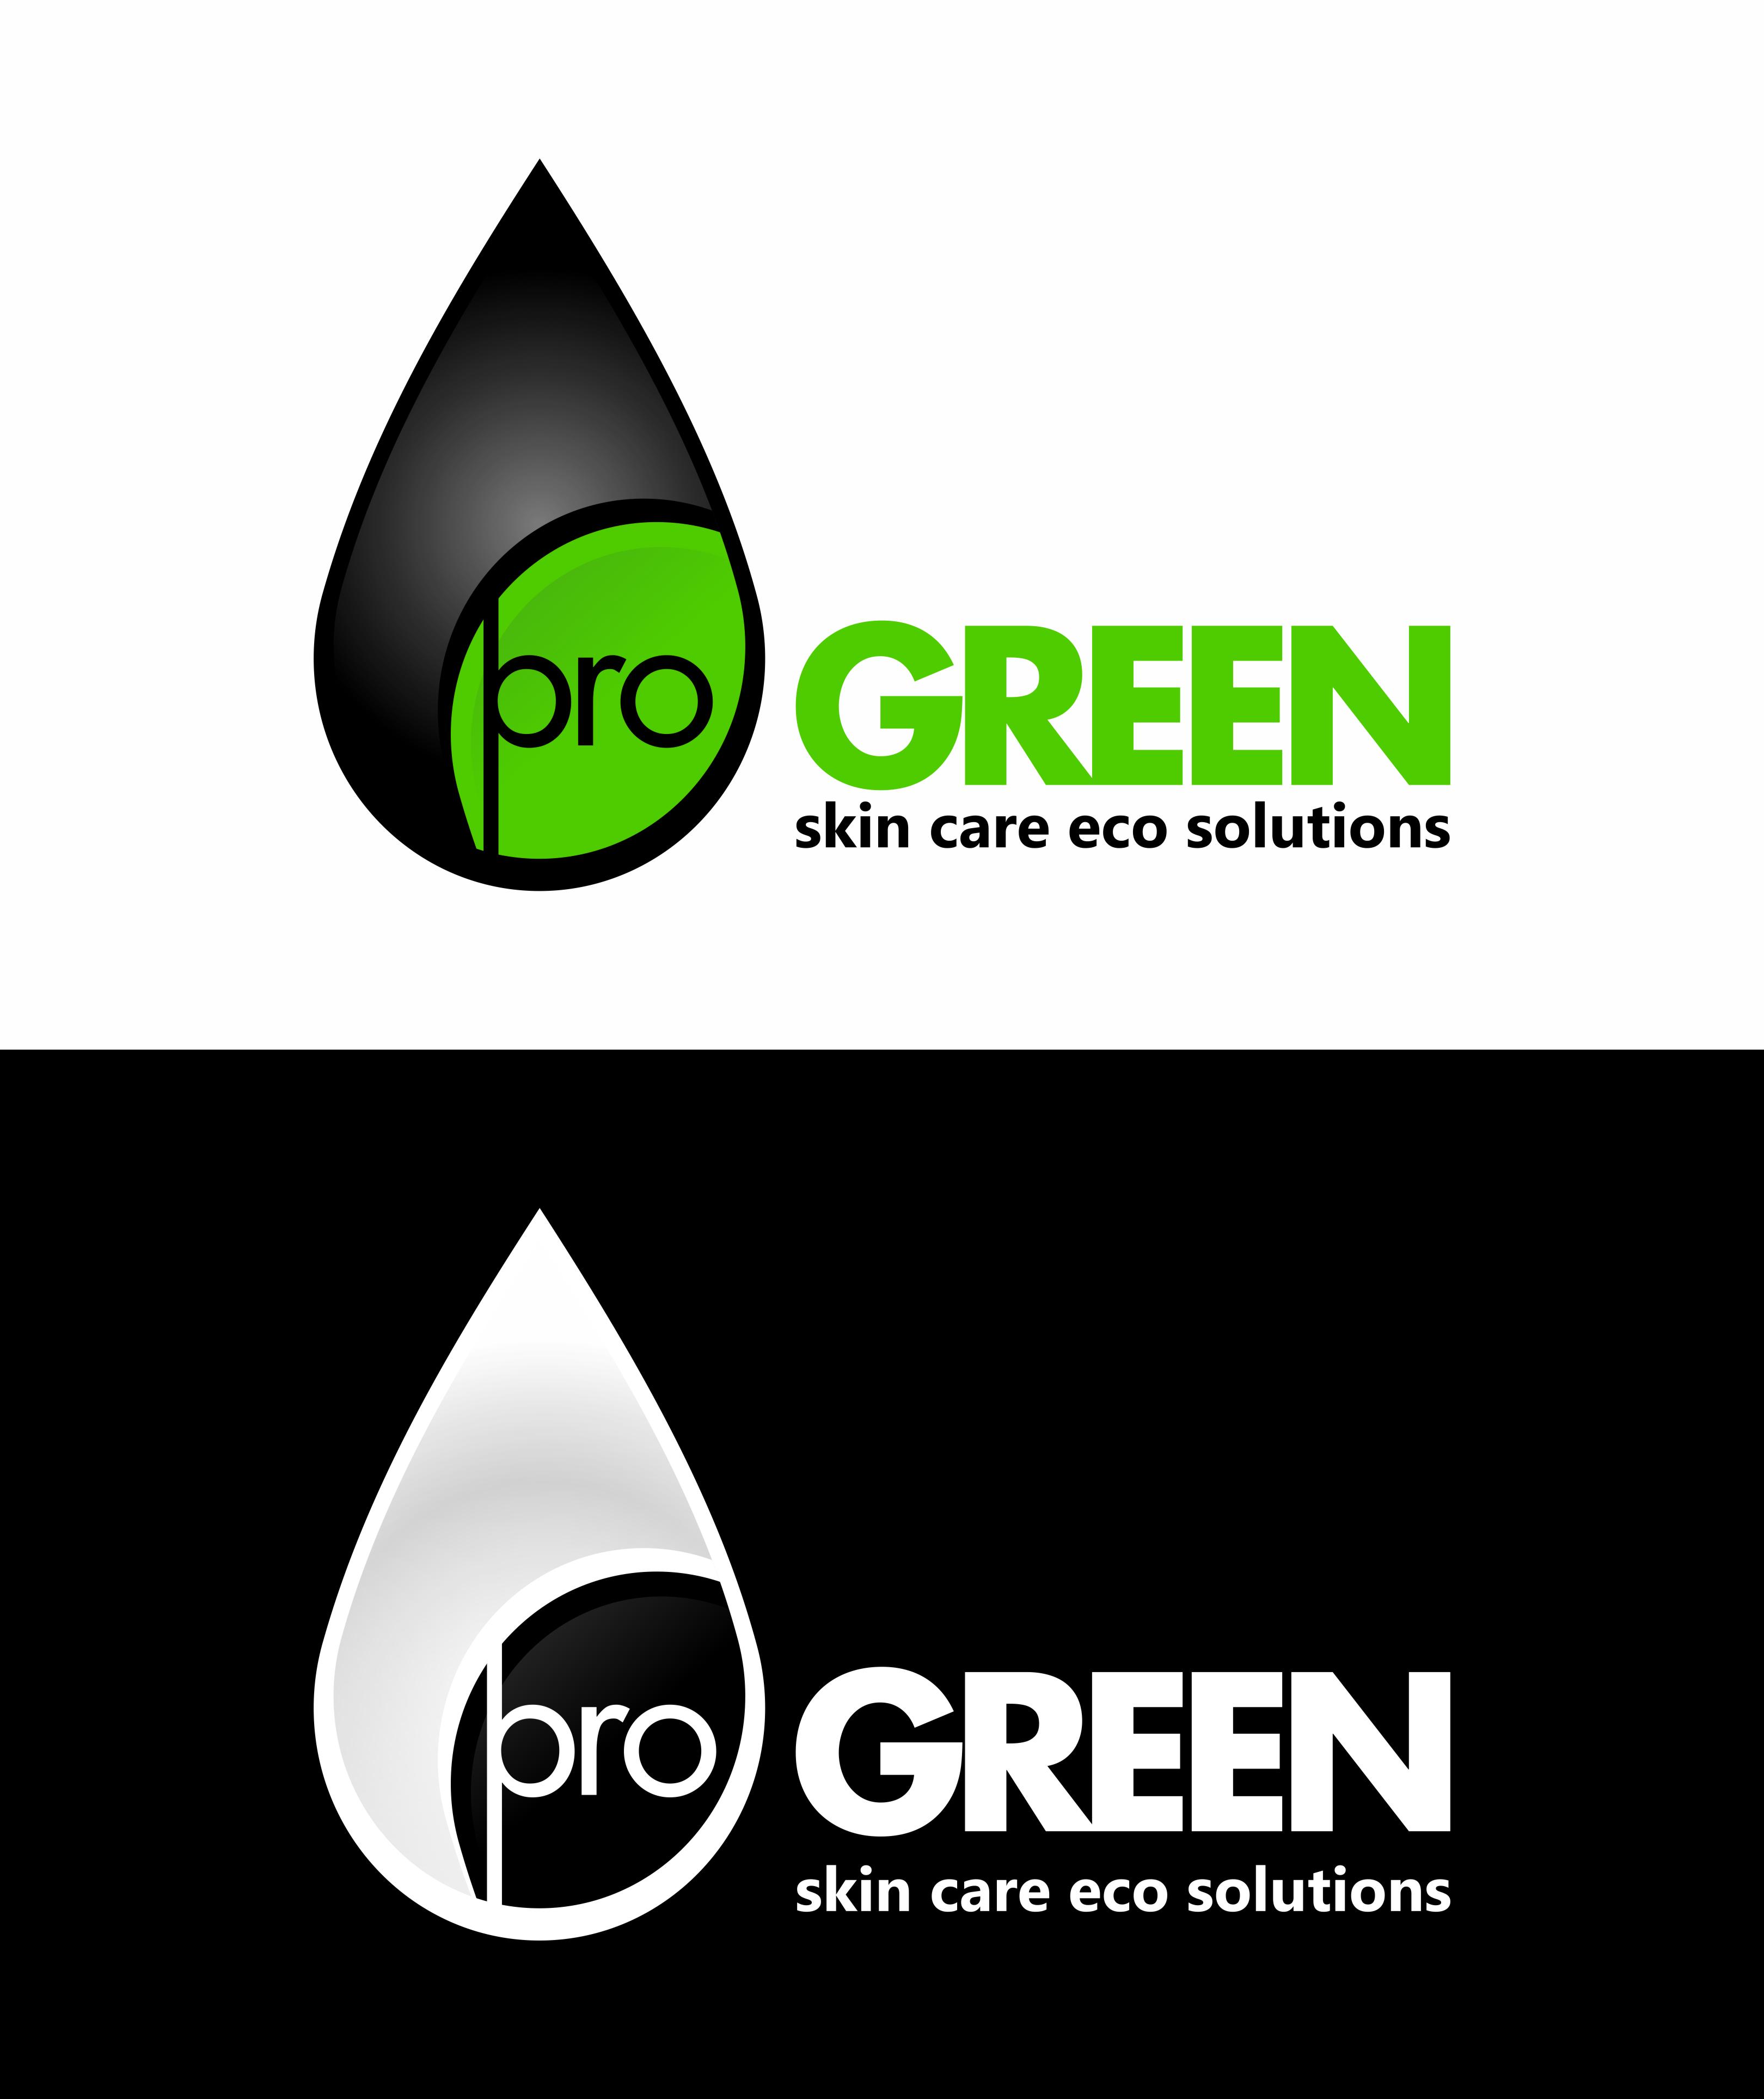 Логотип ProGreen